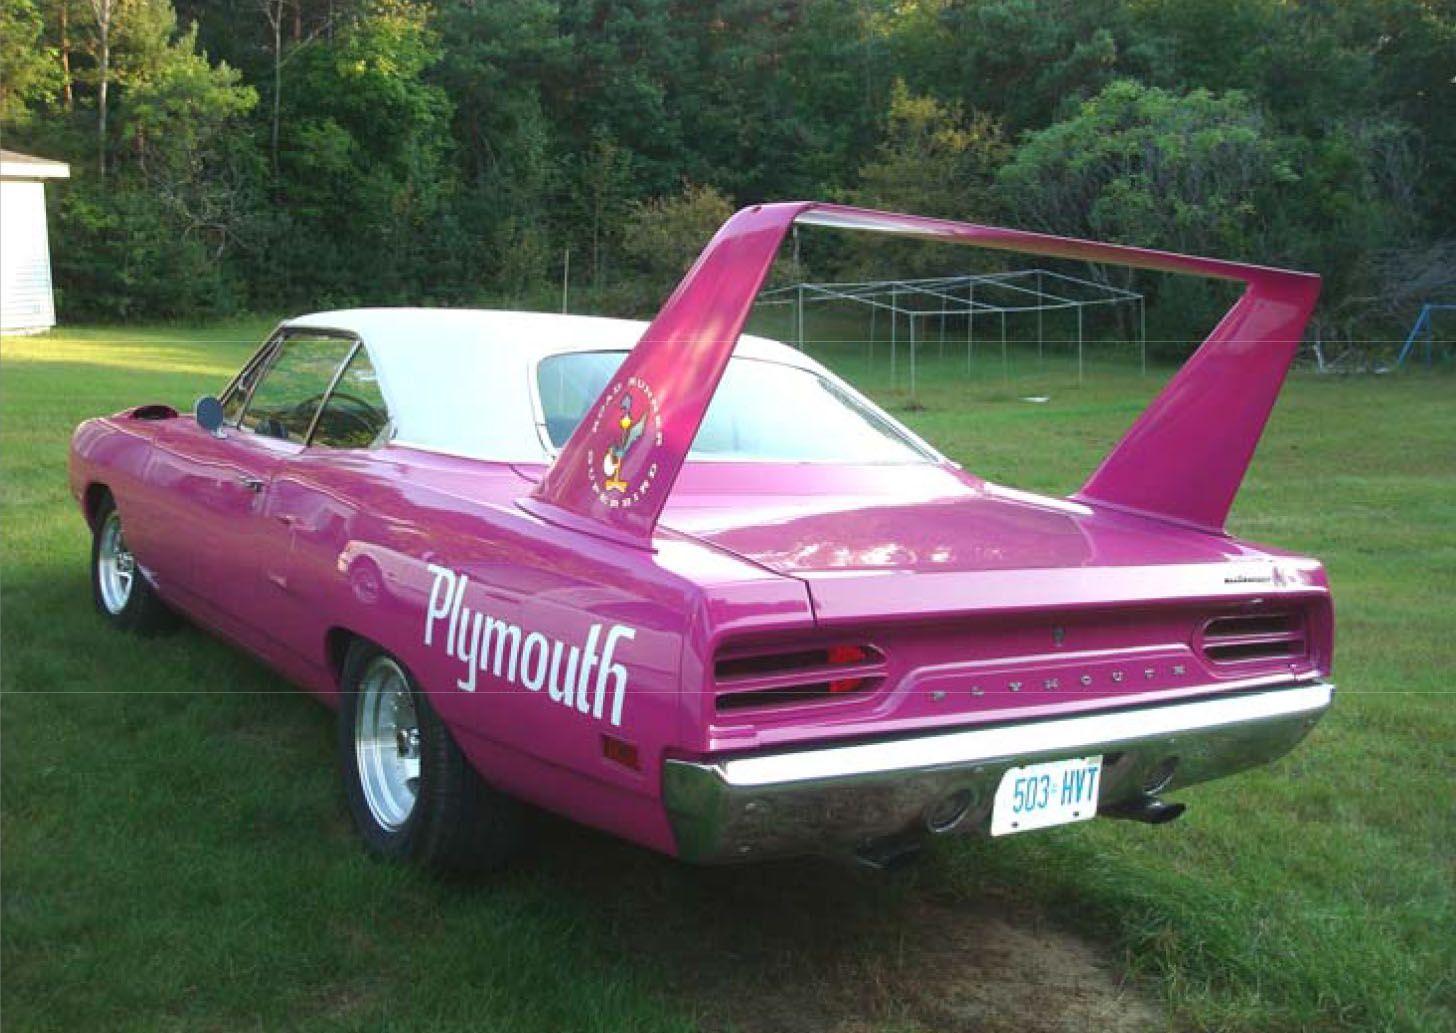 Pink Plymouth Superbird Plymouth Superbird Dodge Muscle Cars Superbird